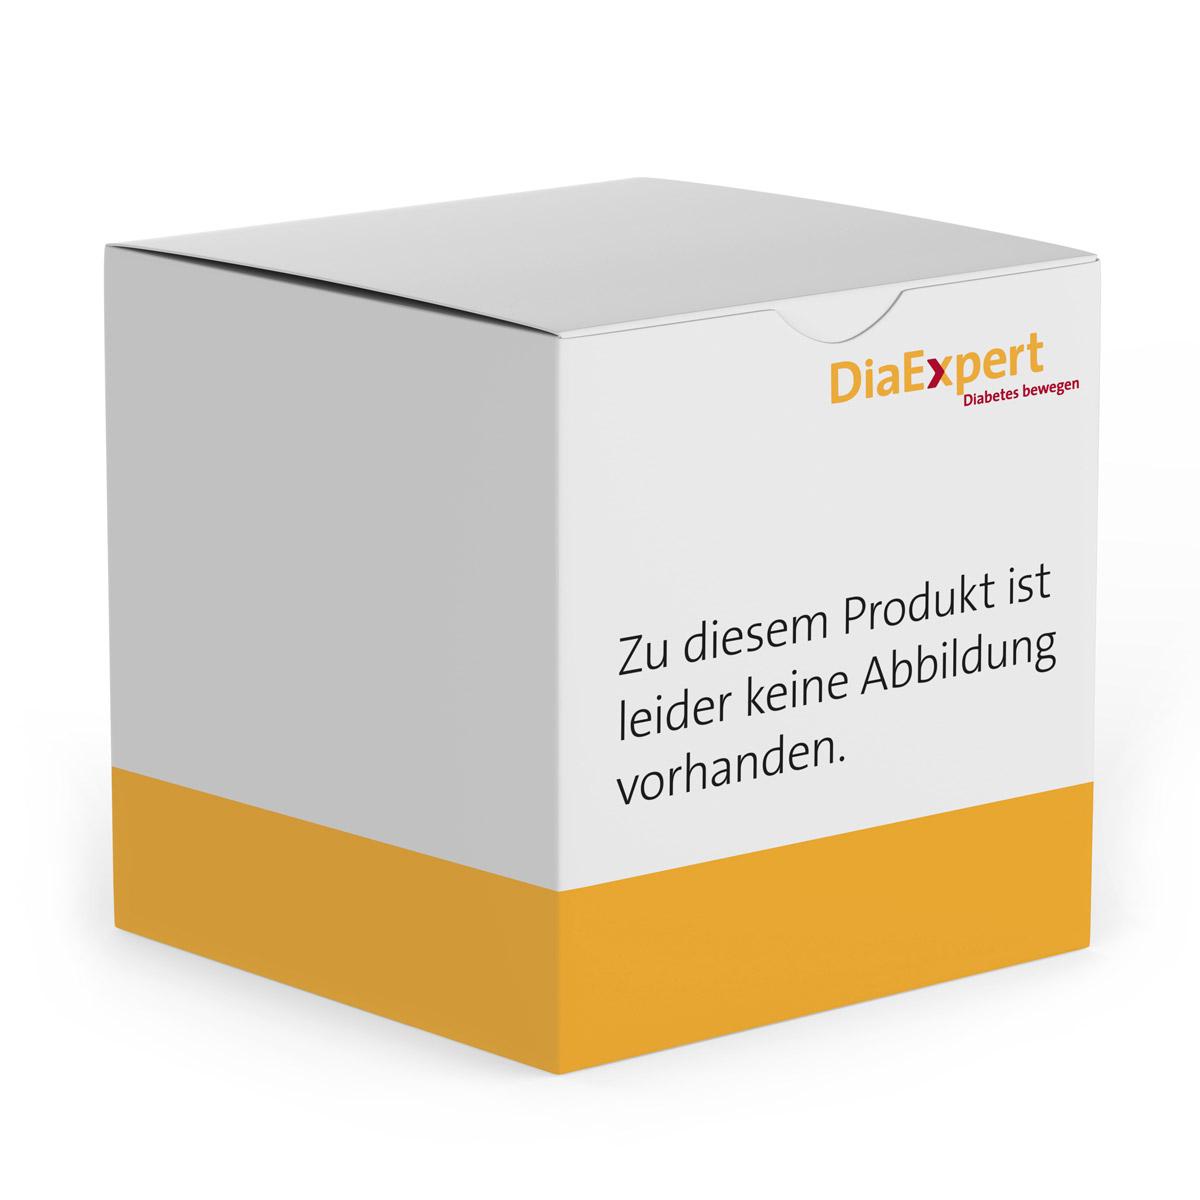 Traubenzucker-Würfel Erdbeere DiaExpert